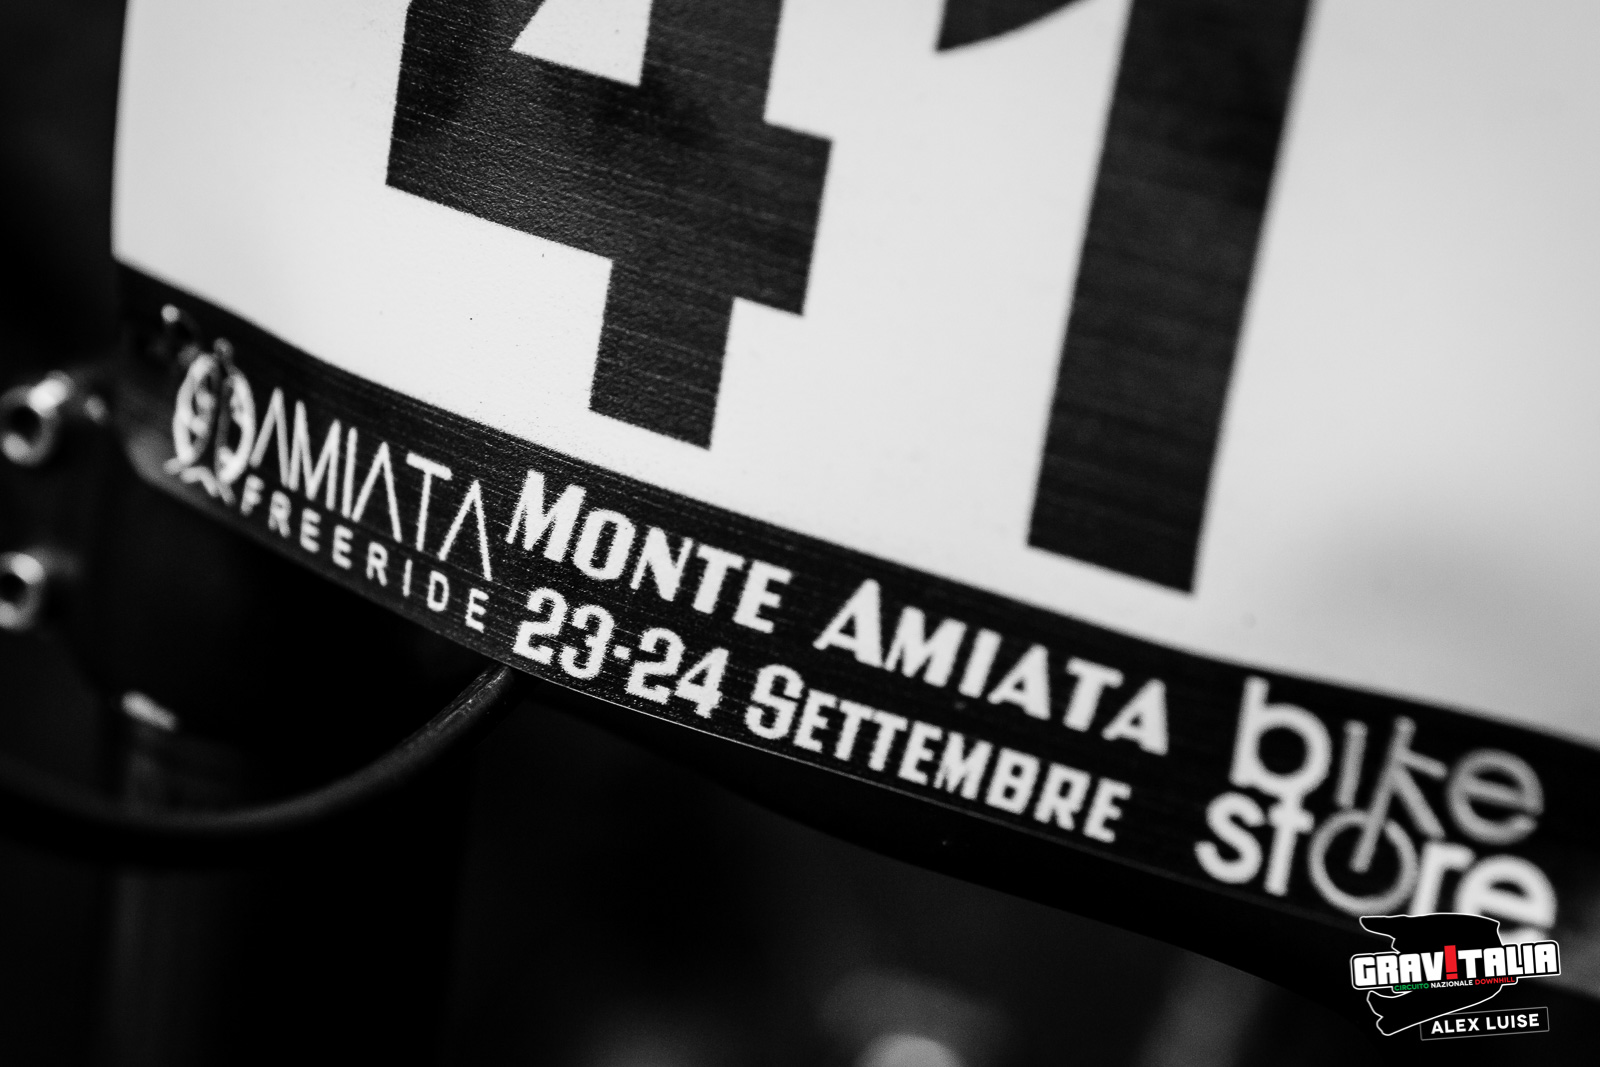 monte_amiata_rd5_final_008